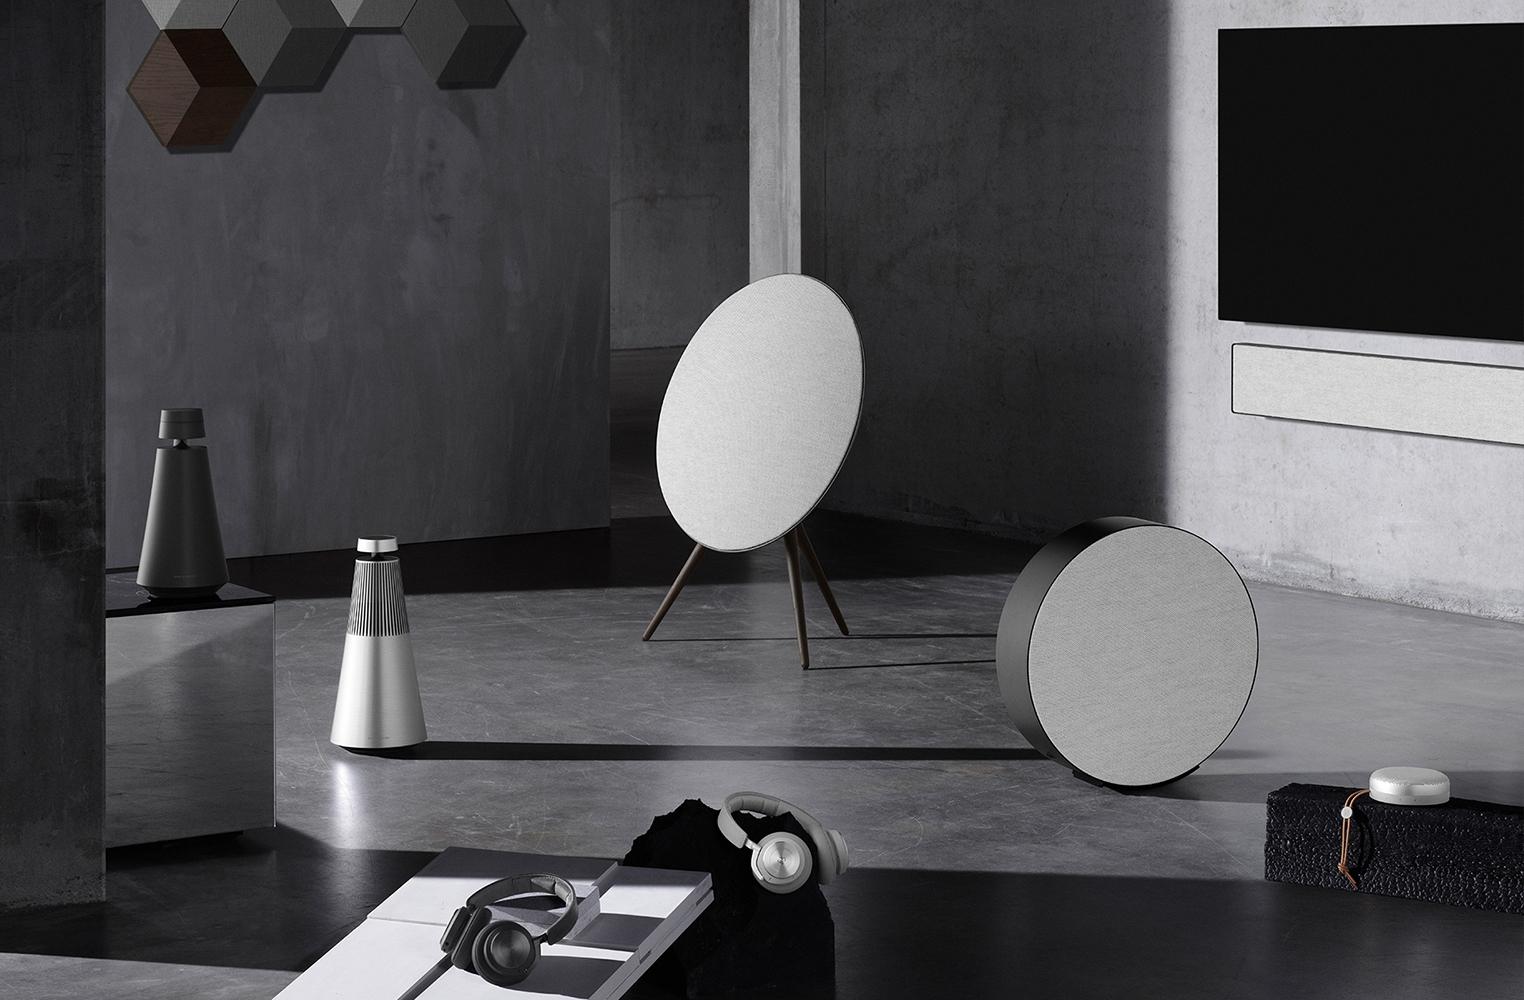 Bang & Olufsen - B&O Play - Premium High Quality Sound - Headphones - Earphones - Speaker - iPhone X